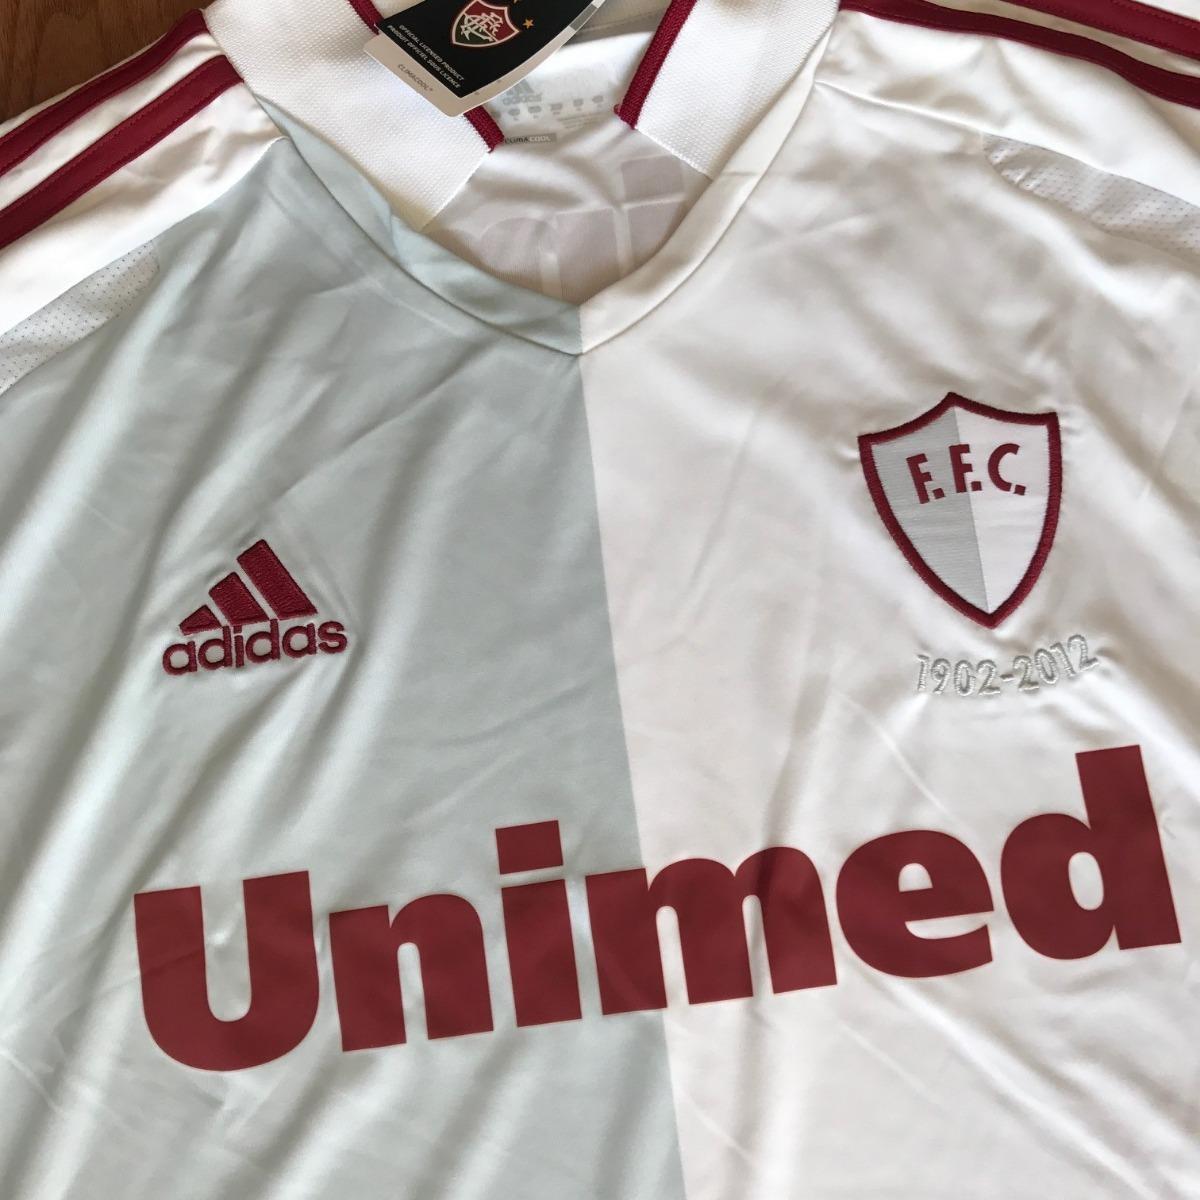 d664cd4e6c Camisa Fluminense adidas 110 Anos Comemorativa 1902 Nova - R  390